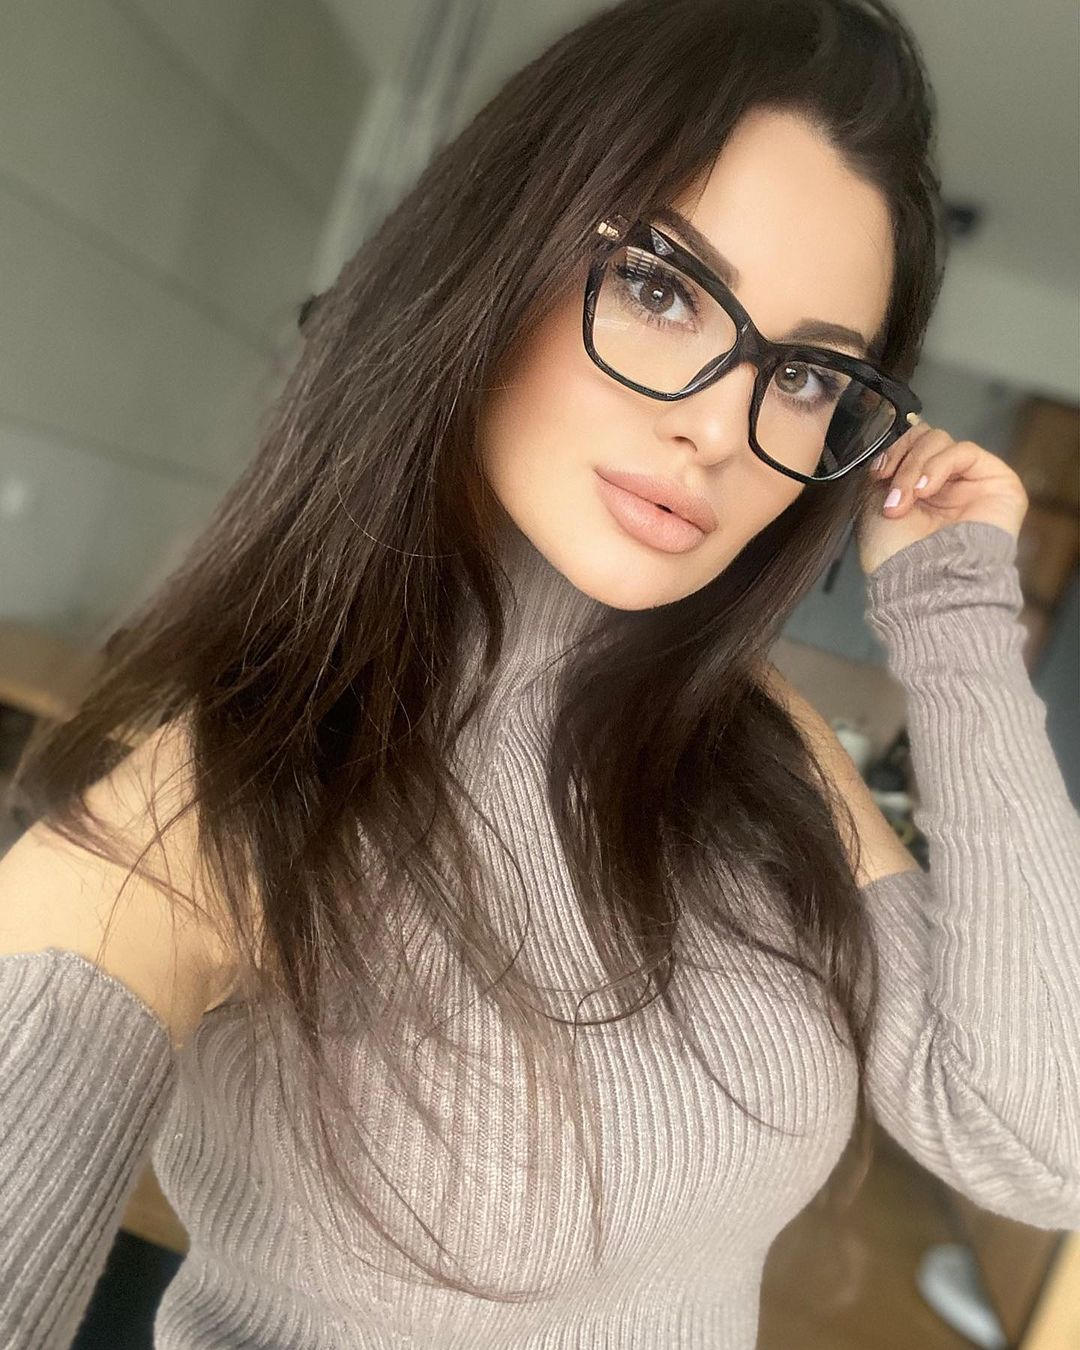 Paulina-Mai-Wallpapers-Insta-Fit-Bio-3